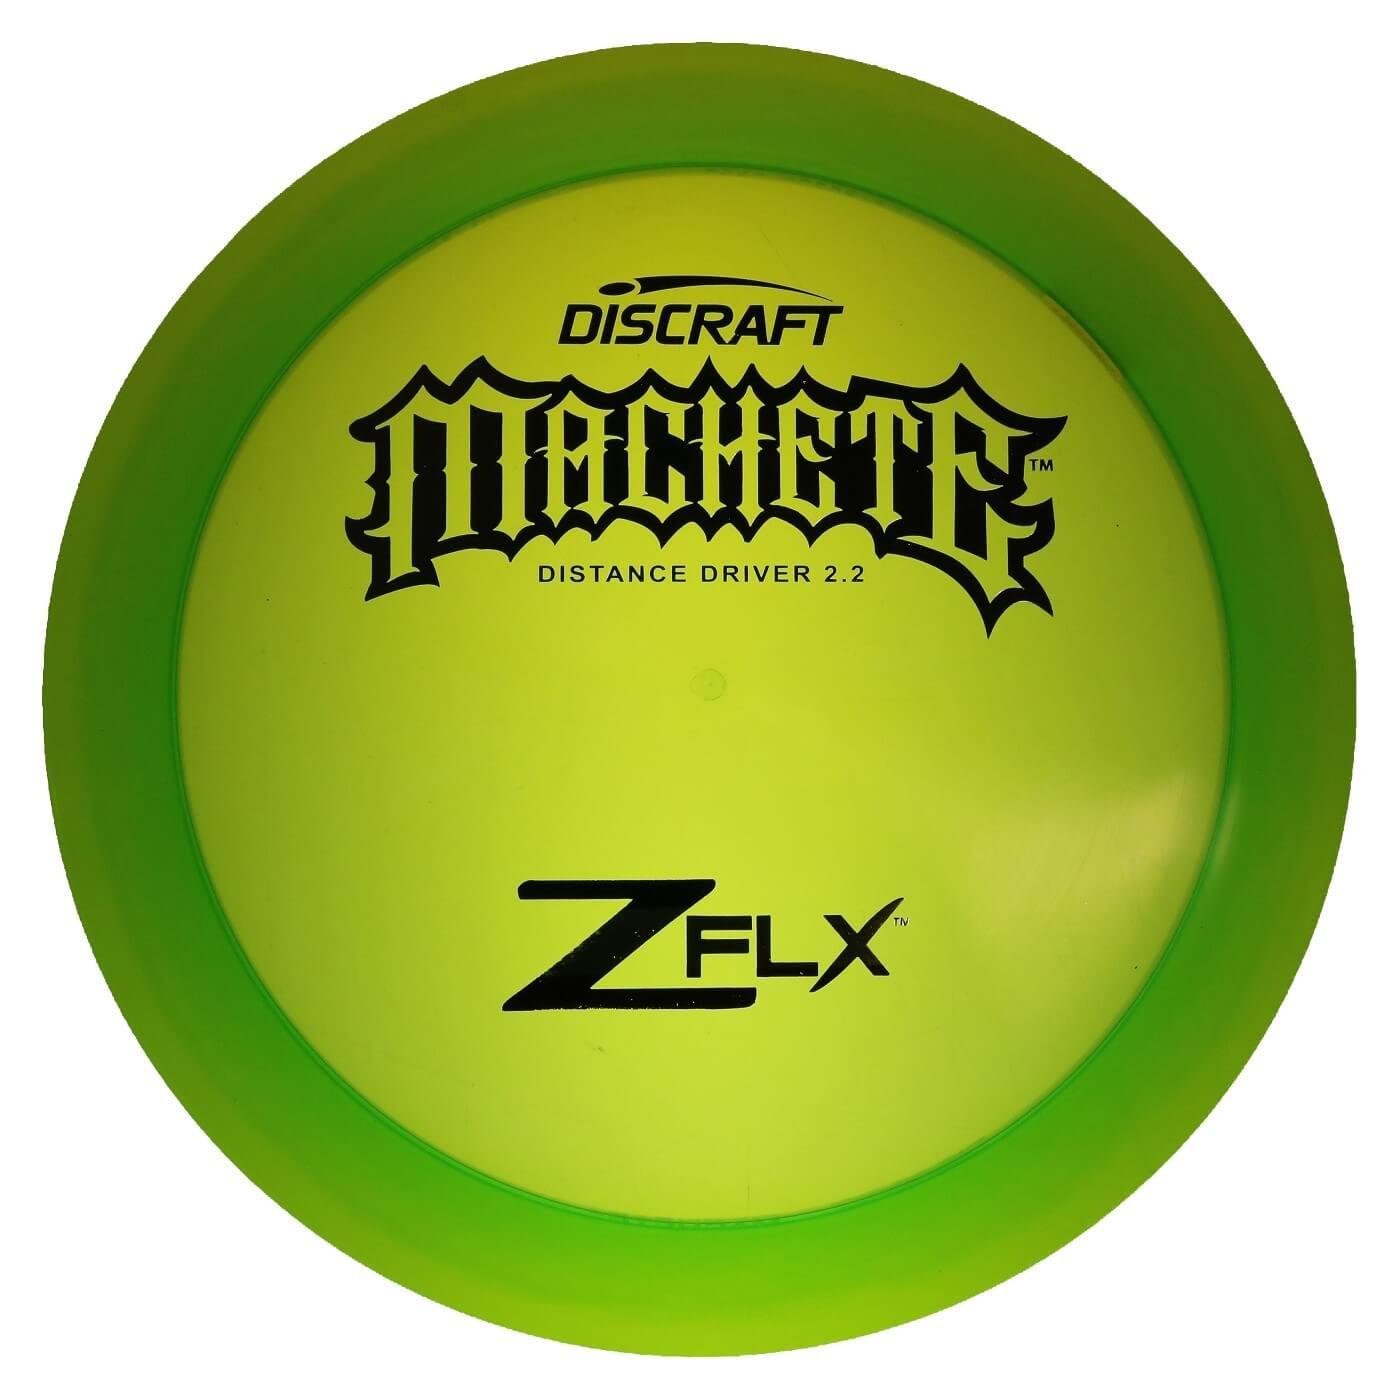 Discraft Z FLX Machete